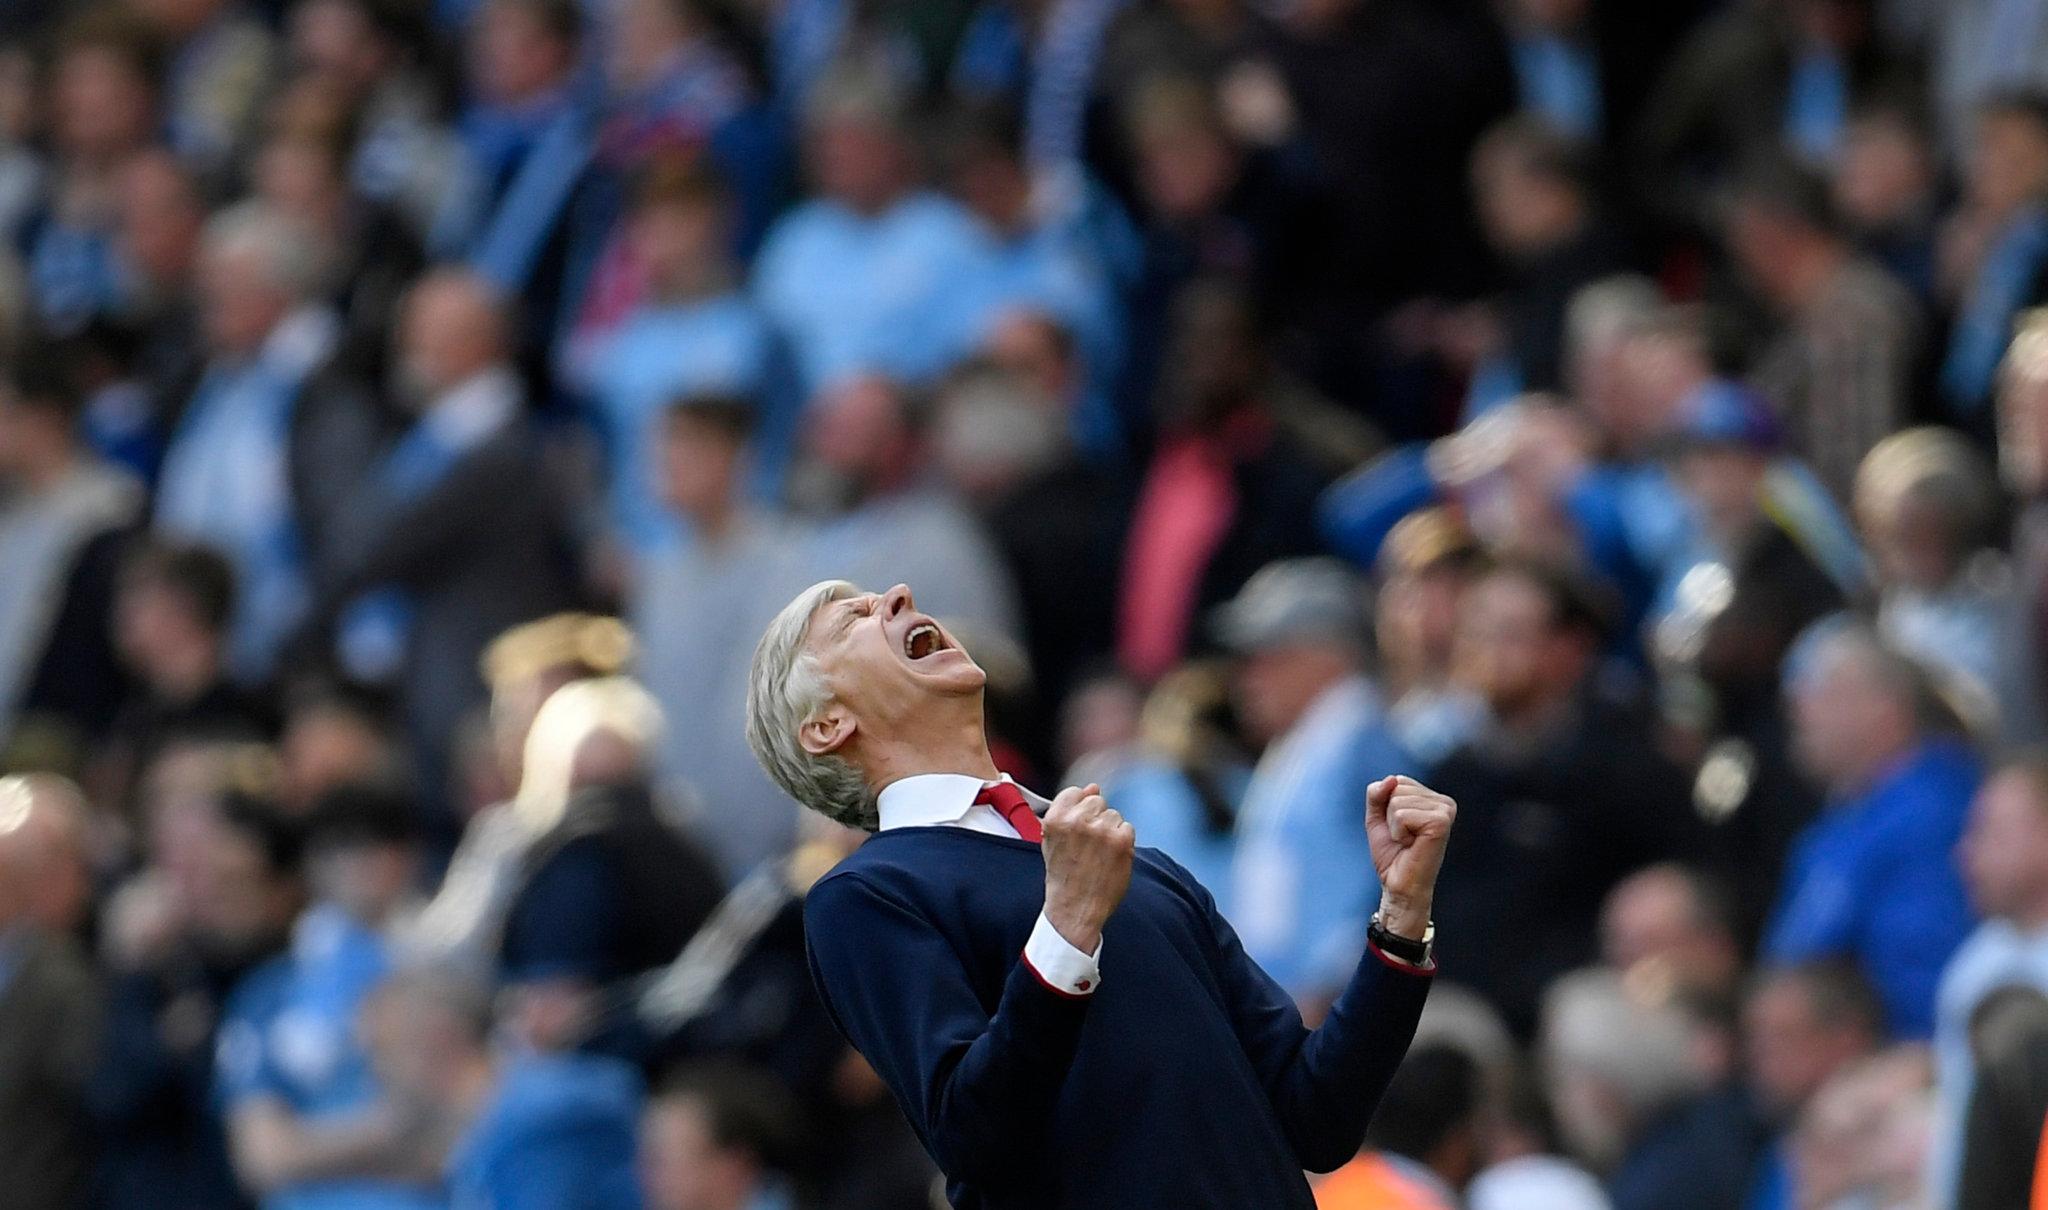 Wenger bỏ ngang phỏng vấn sau trận thua Tottenham